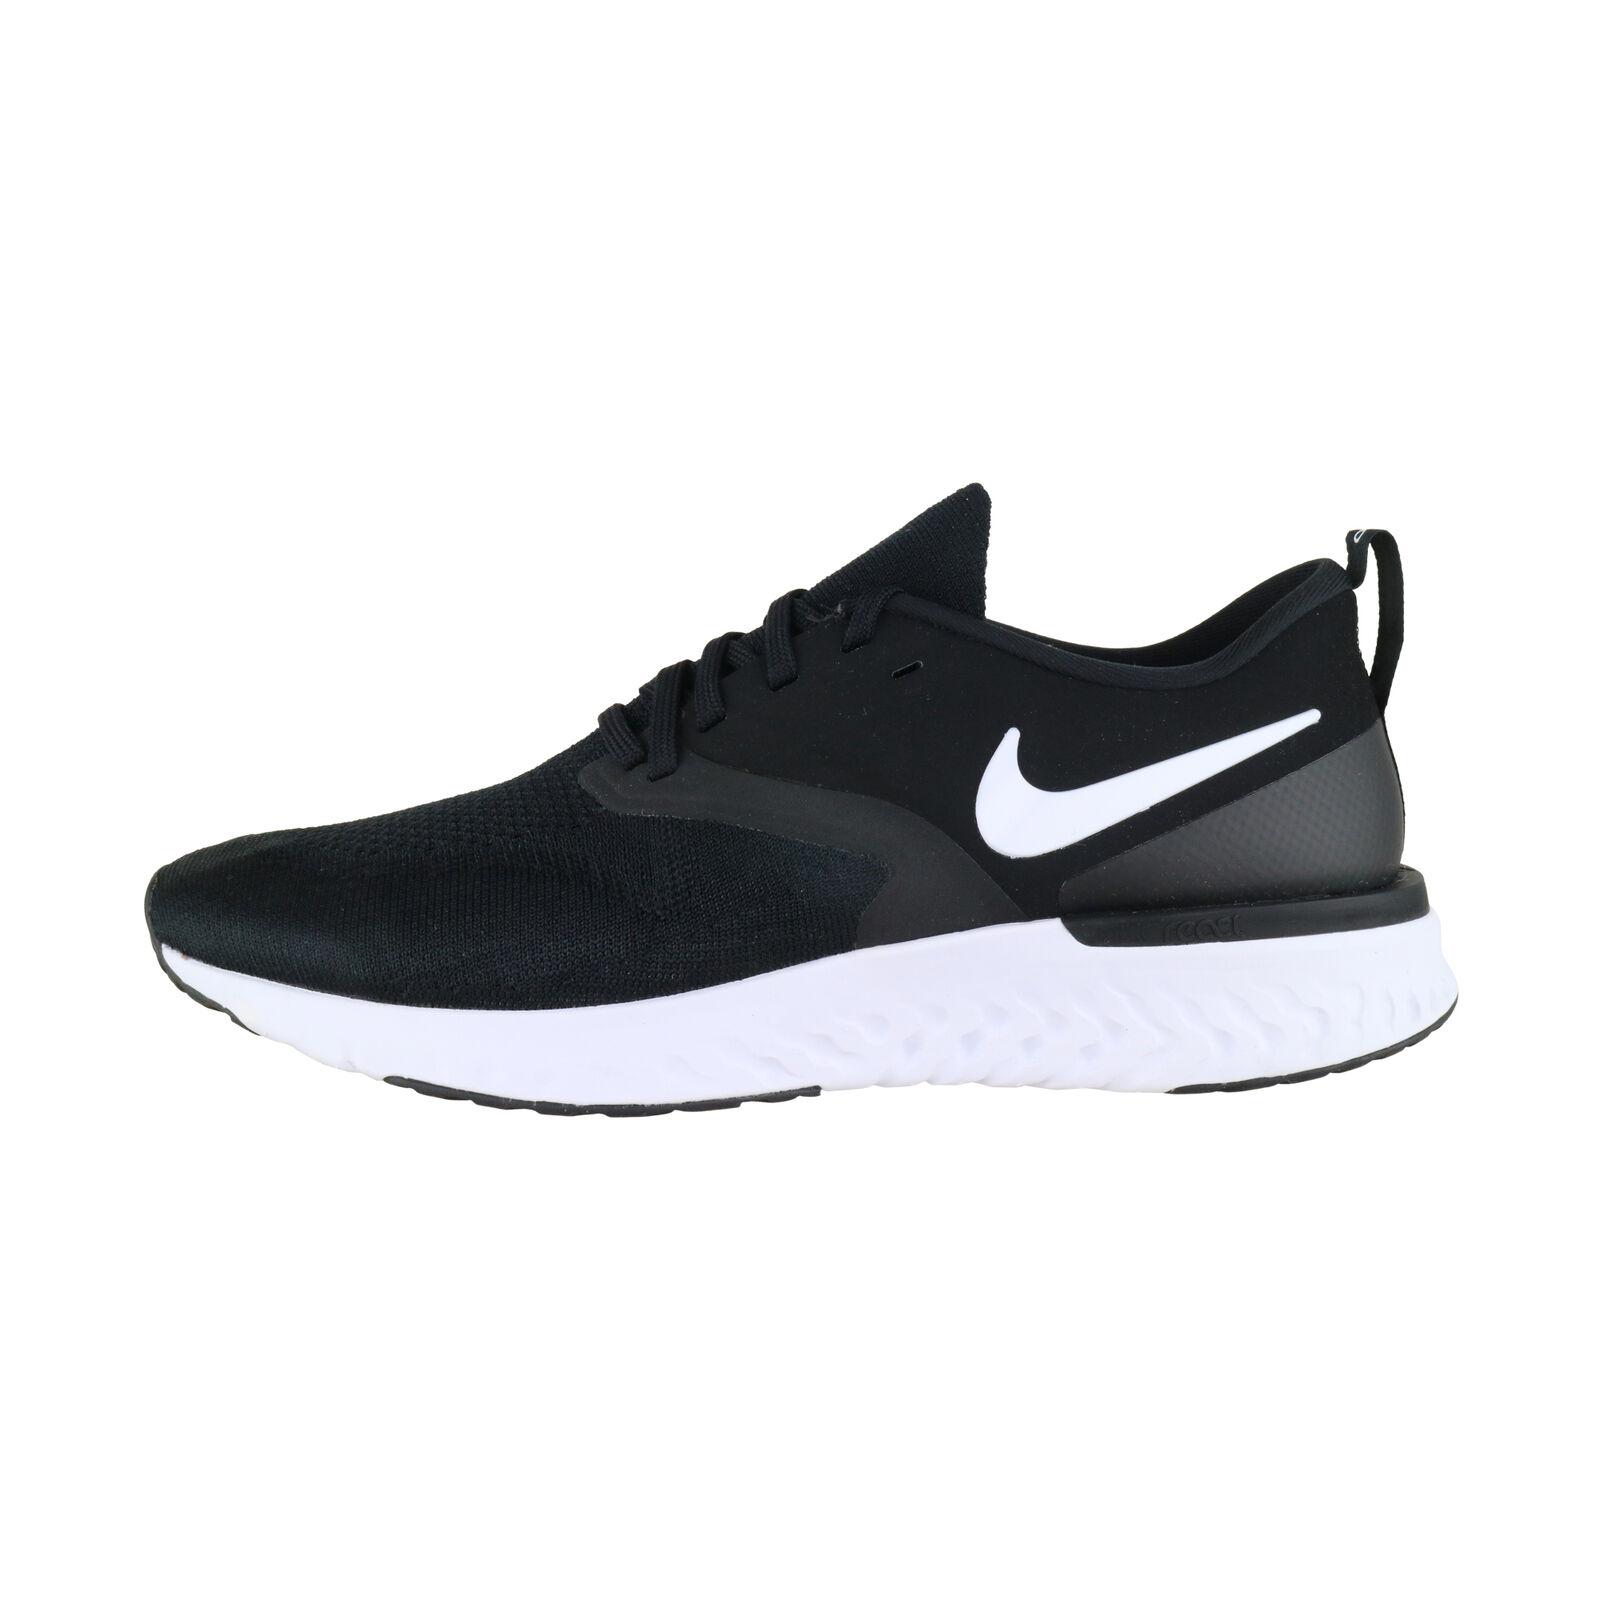 Nike Odyssey React 2 Flyknit Negro blancoo AH1015-010